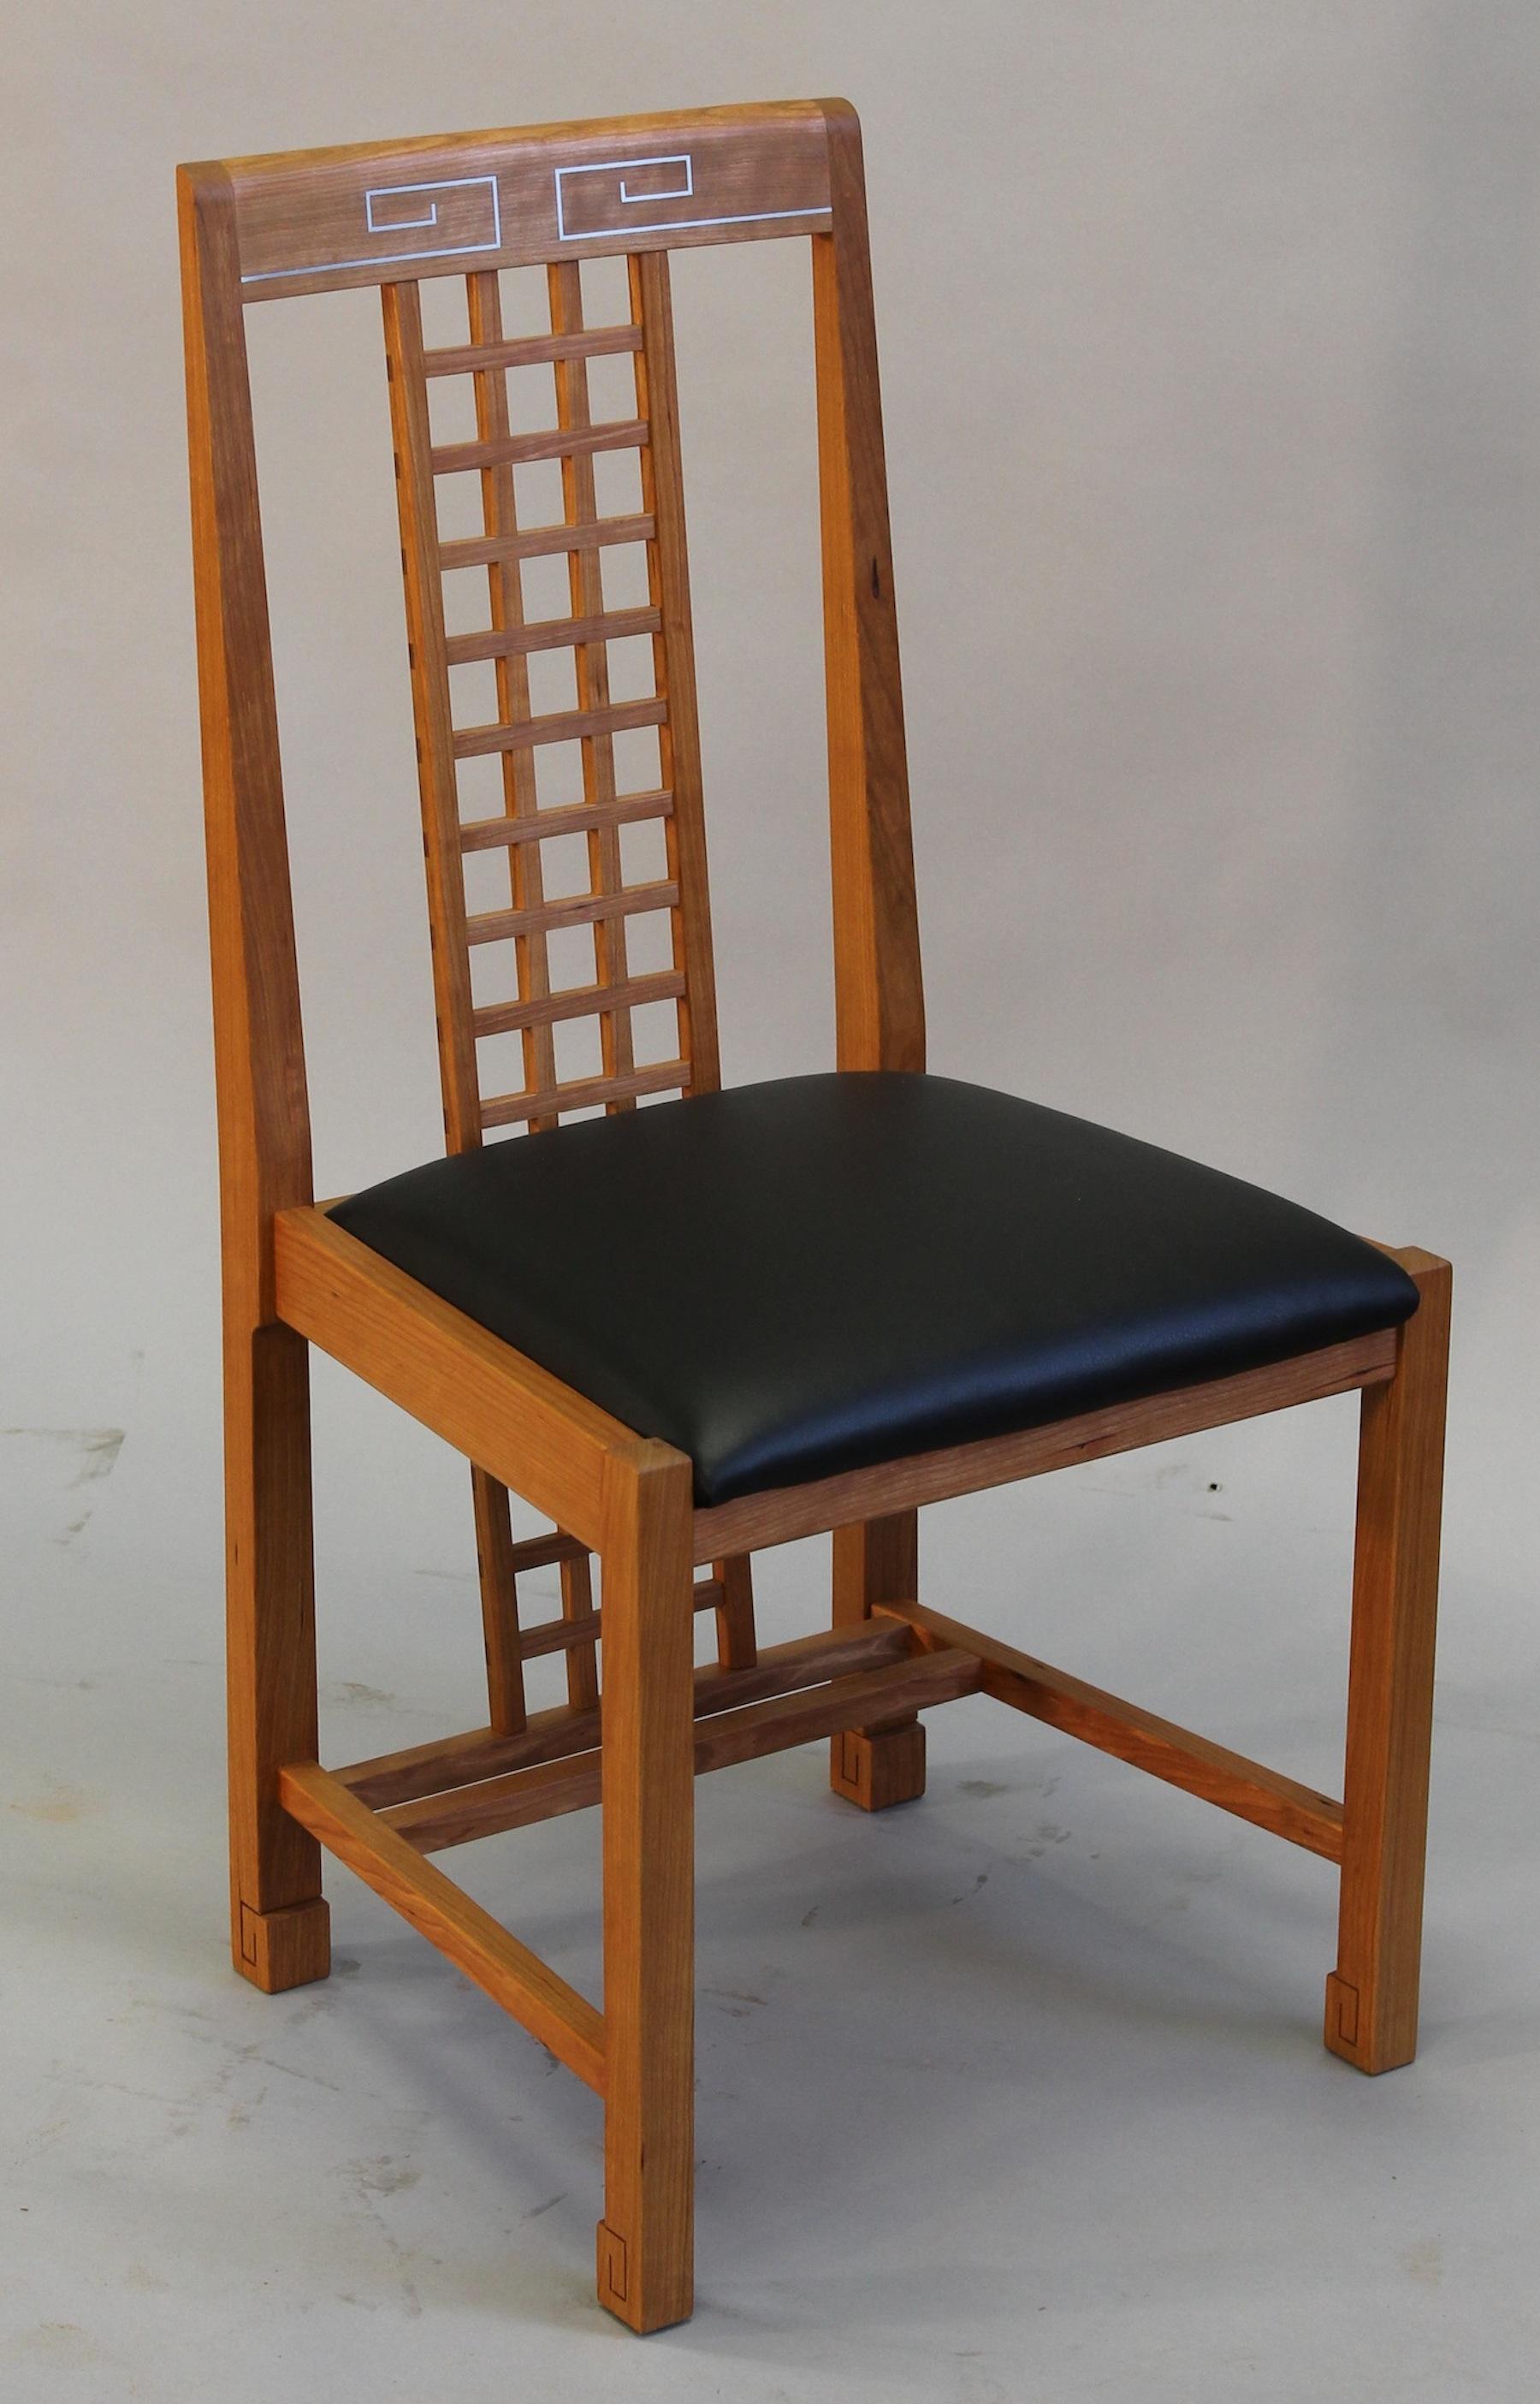 Custom made chair dining chair Beijing Chair hand made chair